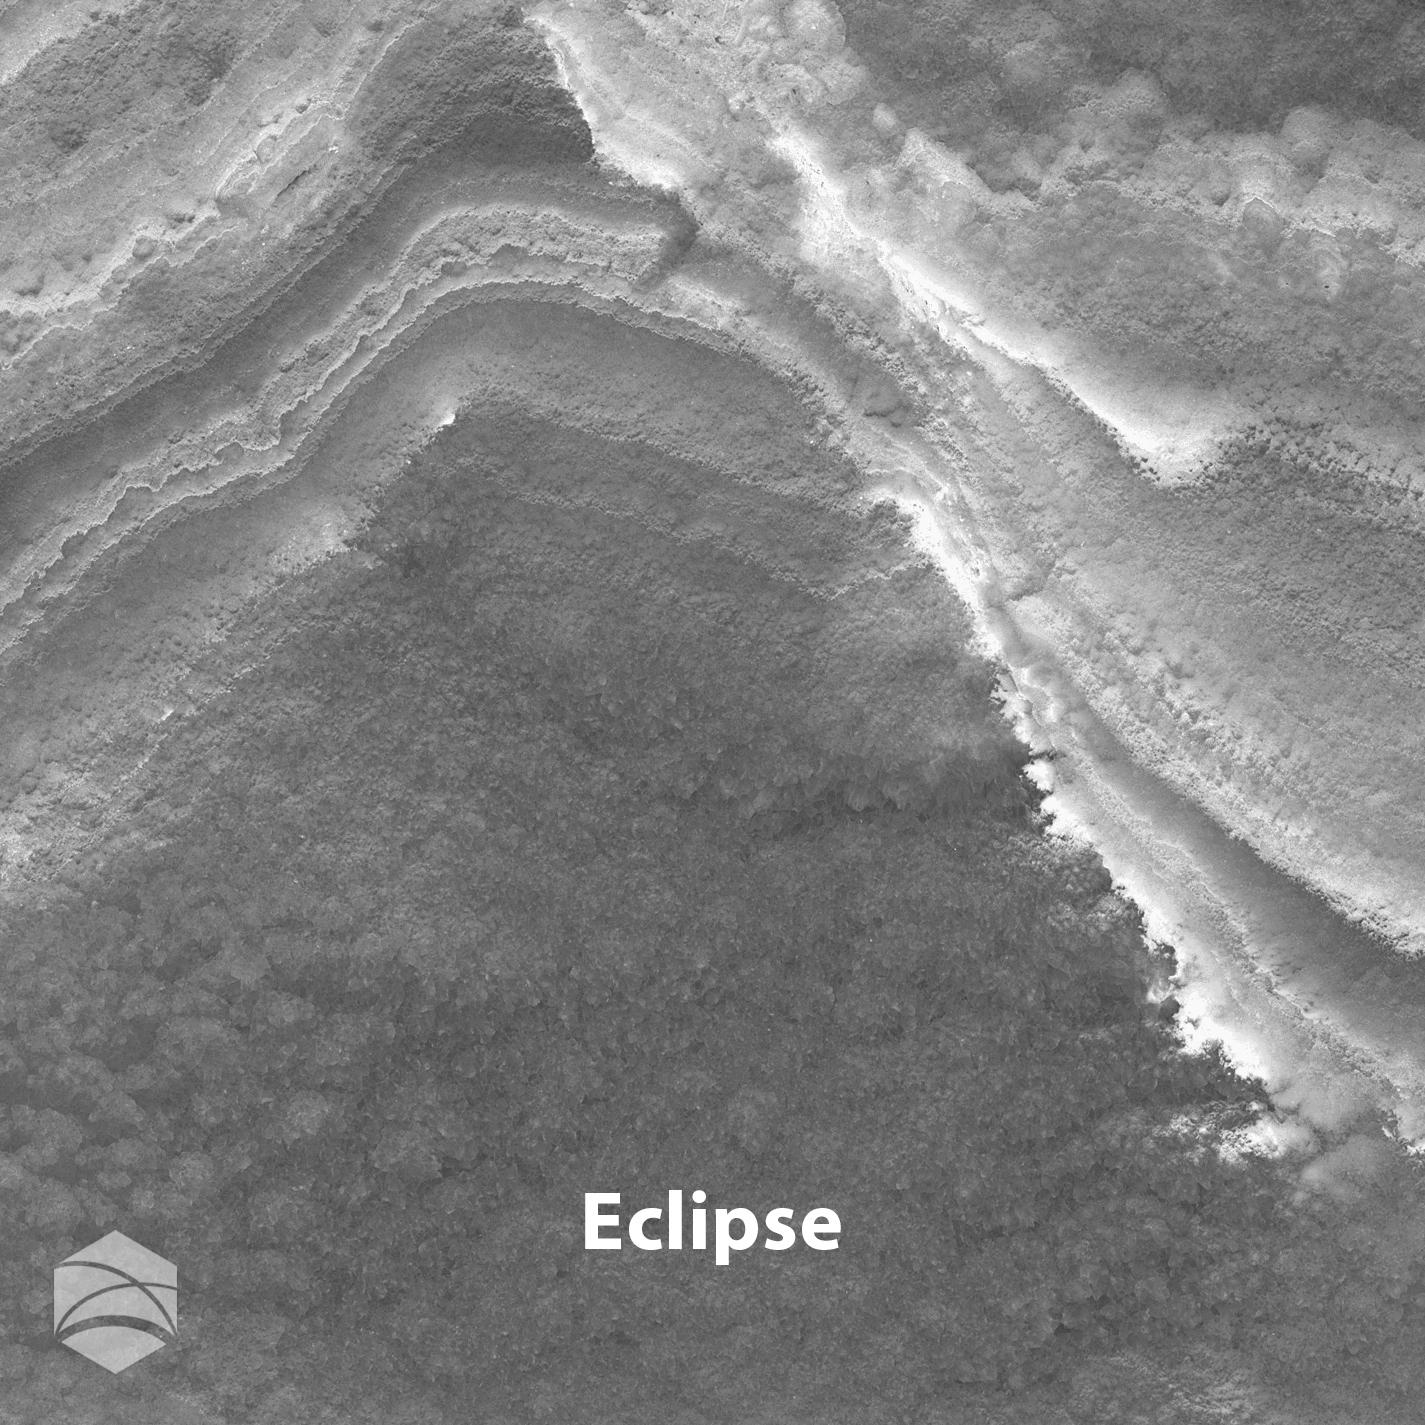 Eclipse_V2_14x14.jpg